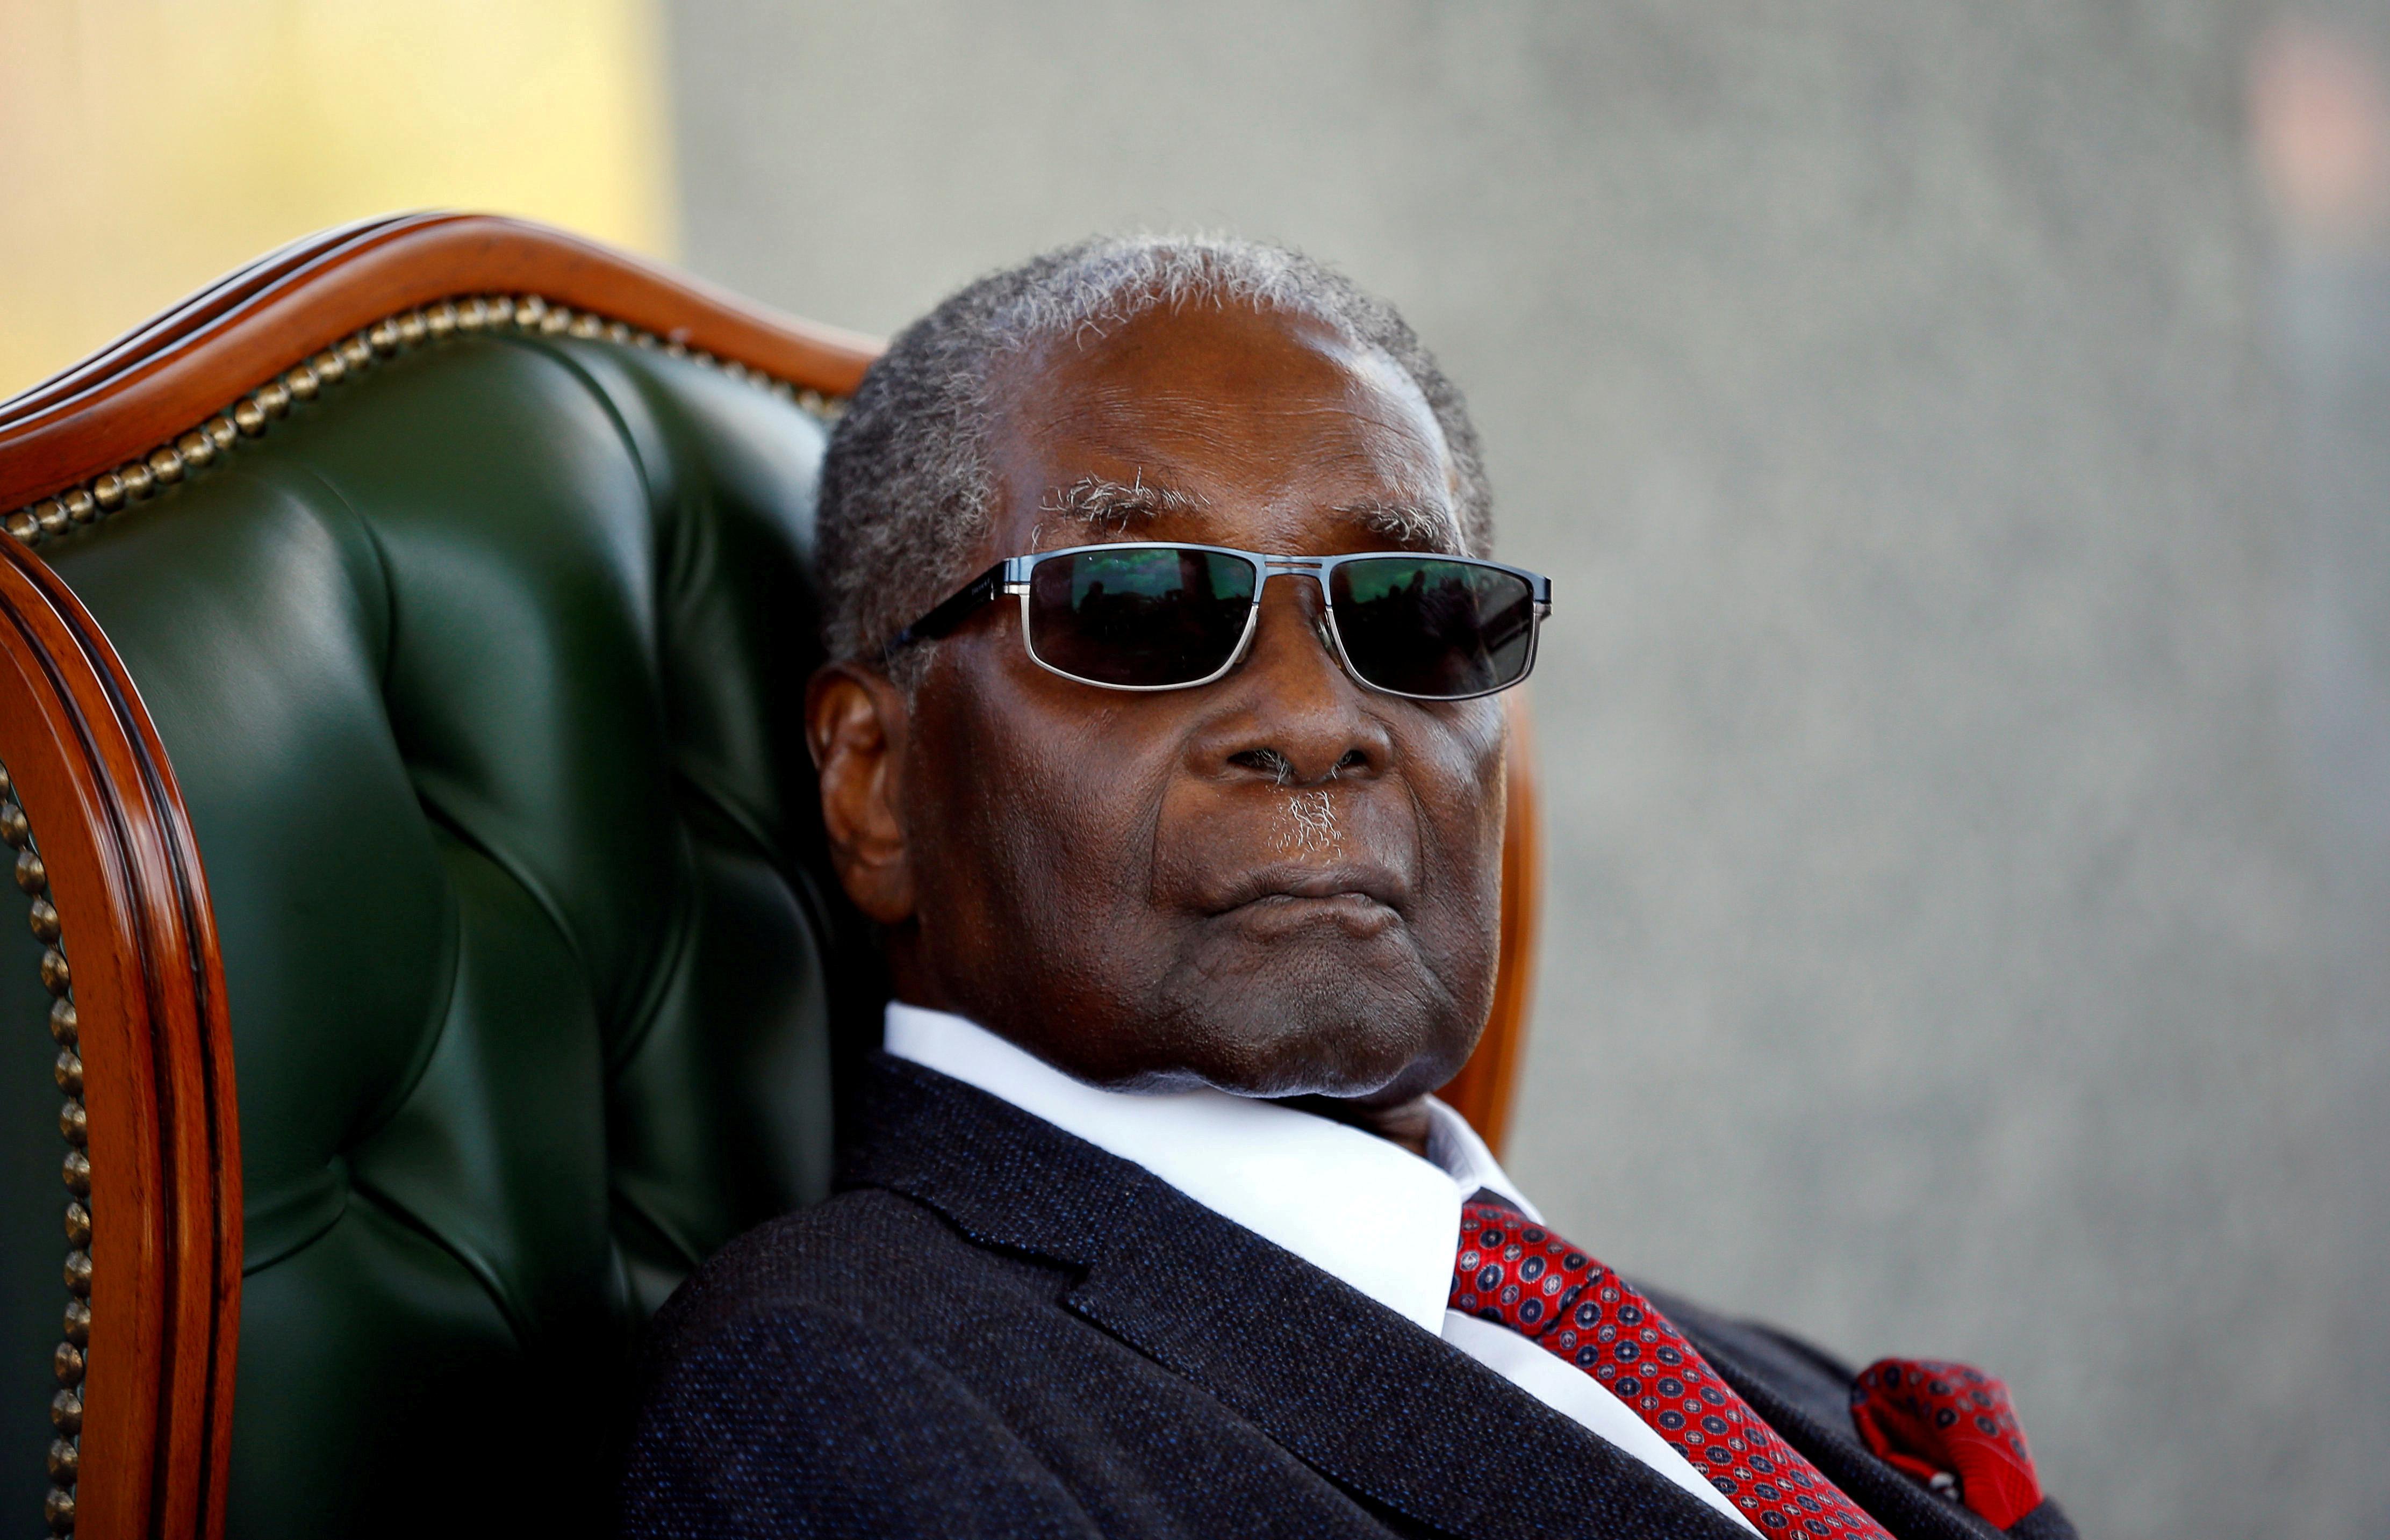 Zimbabwe's Mugabe died from cancer, president says